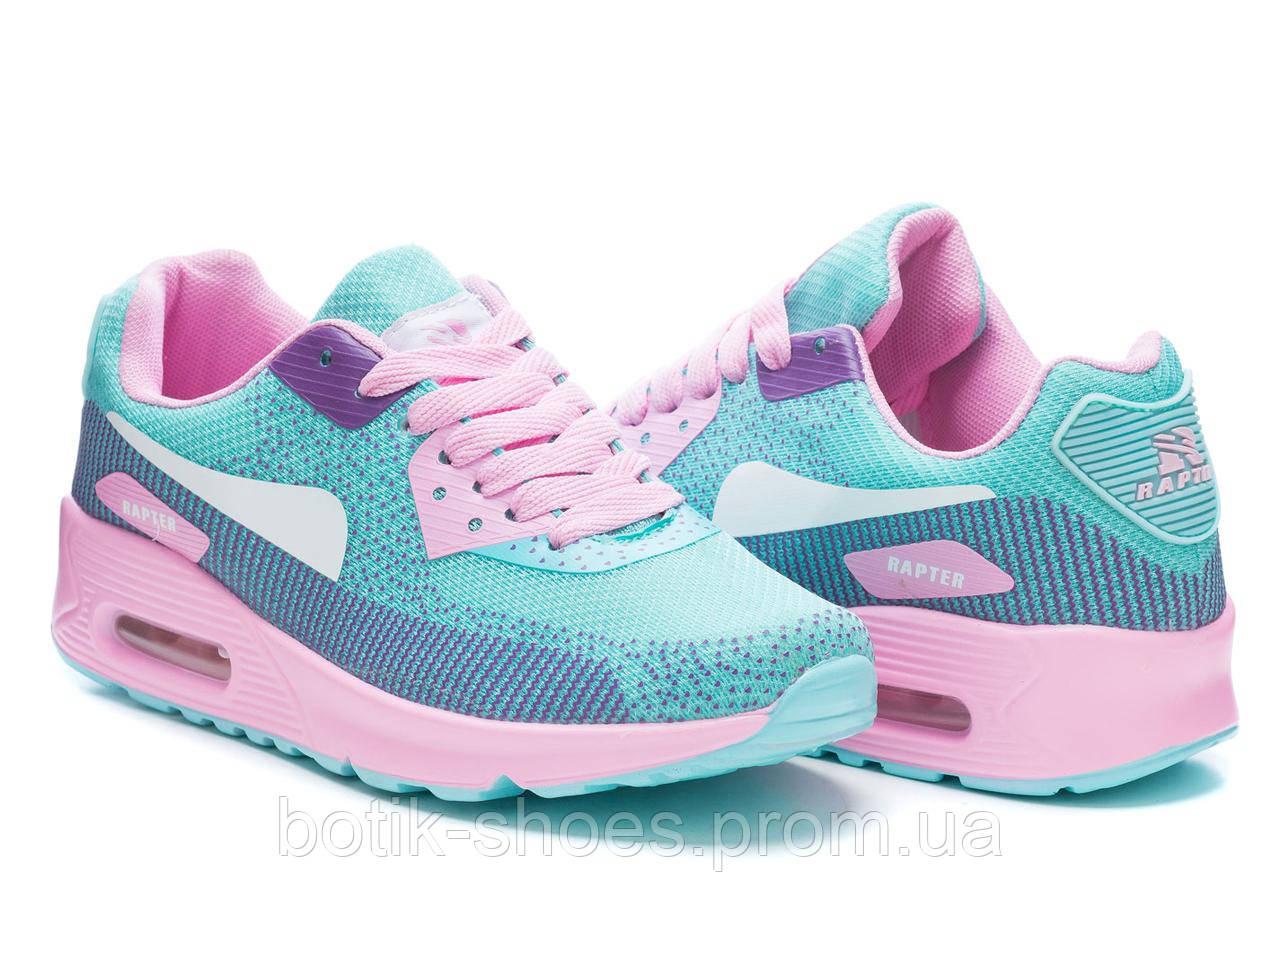 95e64bee Легендарные женские кроссовки Nike Air Max 90 Найк Аир Макс 90, бирюзовые  копия Rapter -